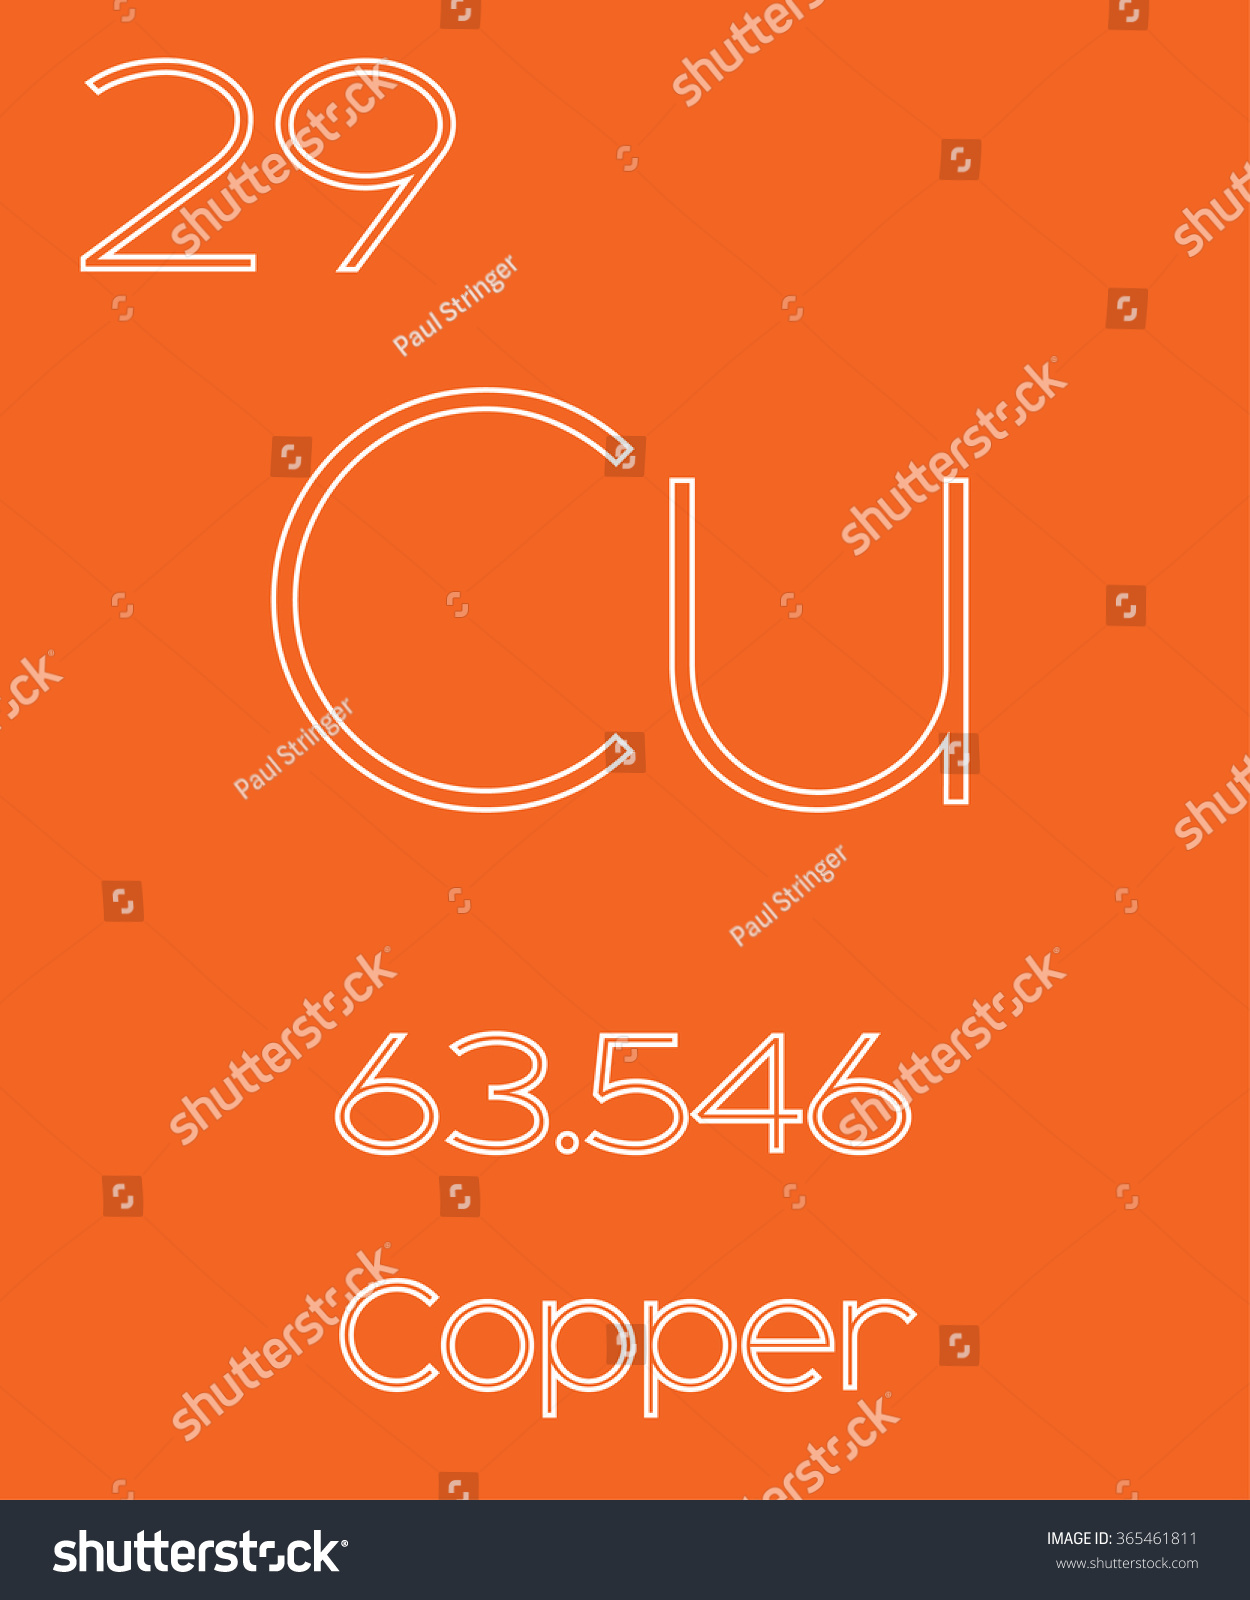 Informative illustration periodic element copper stock vector an informative illustration of the periodic element copper buycottarizona Image collections